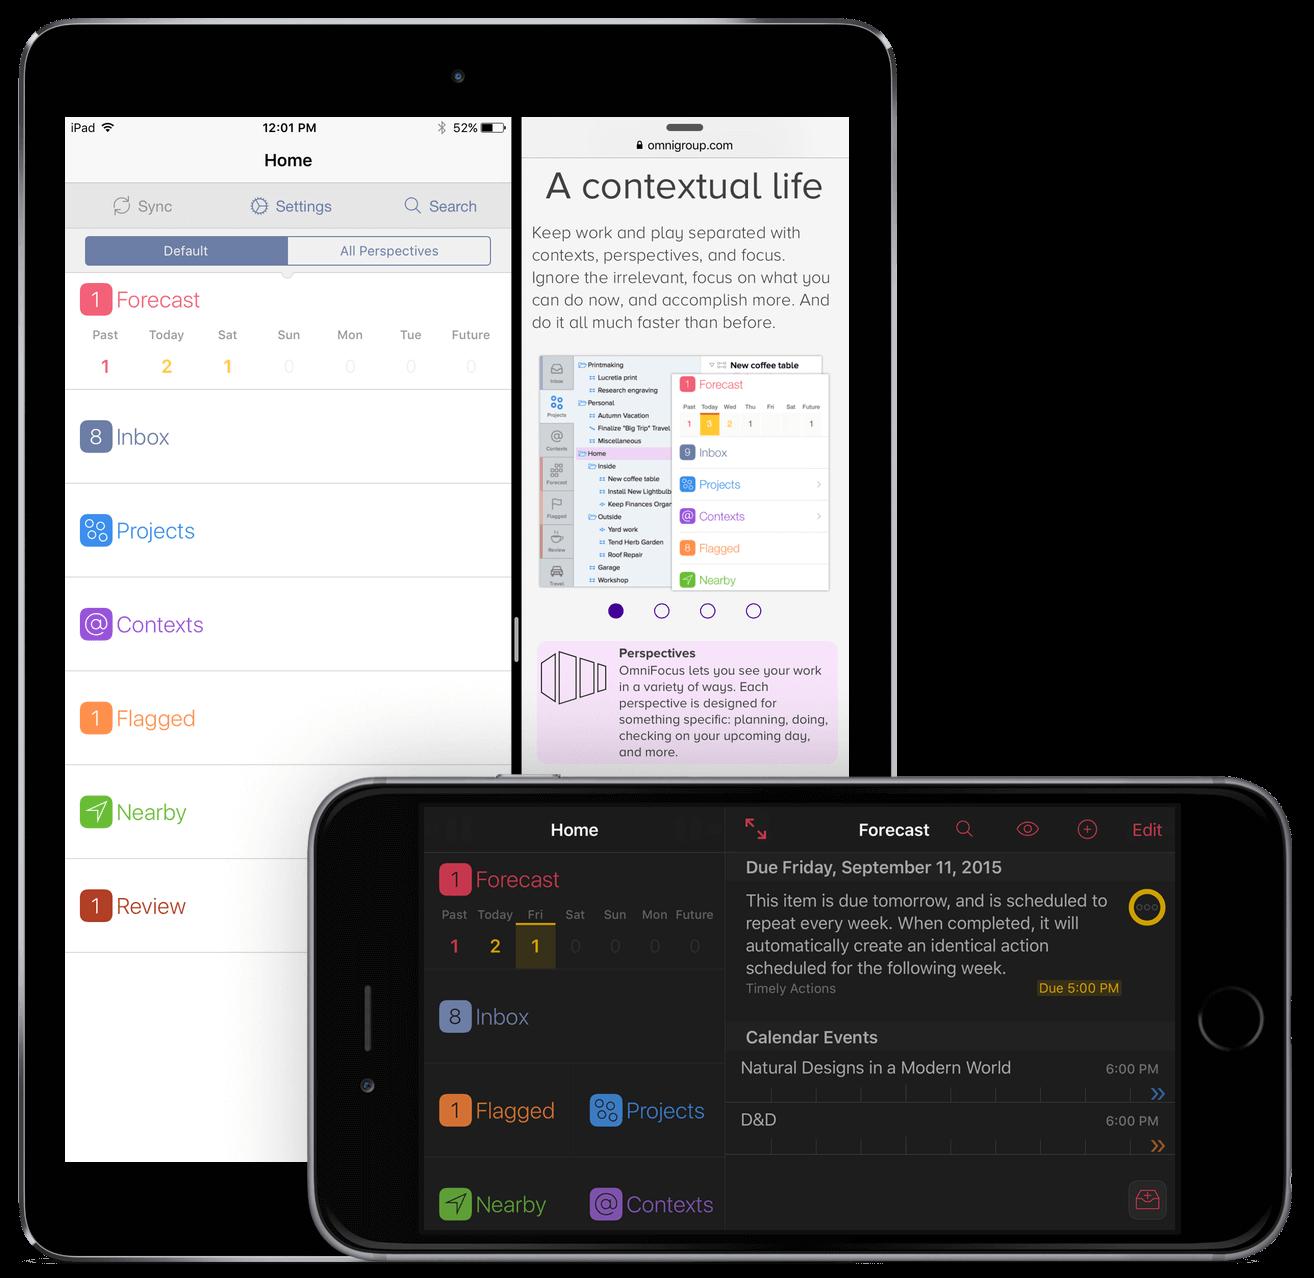 OmniFocus 2 for iOS in landscape orientation on iPhone 6 Plus, and in  portrait orientation